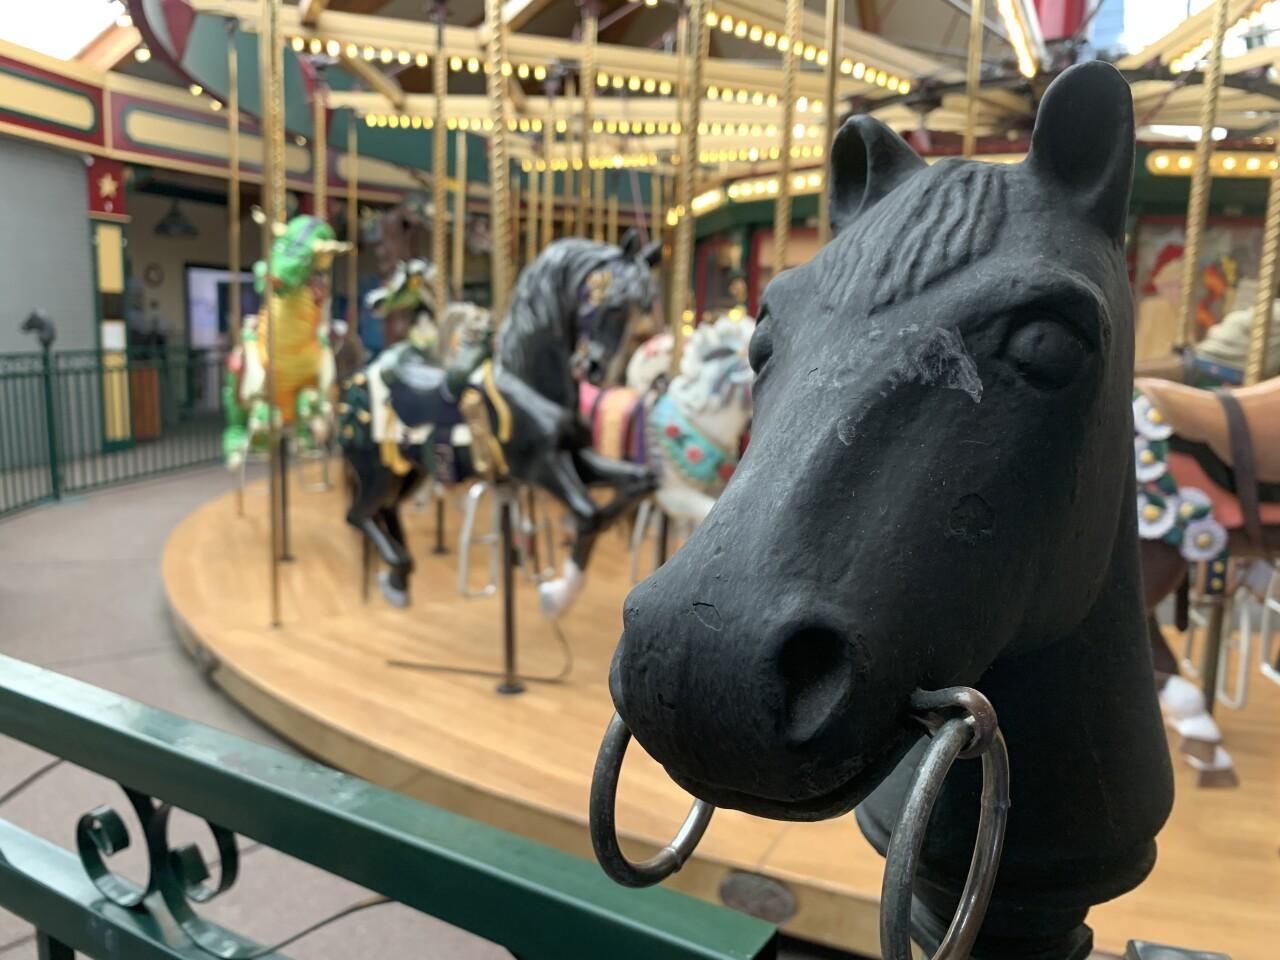 A Carousel in Missoula